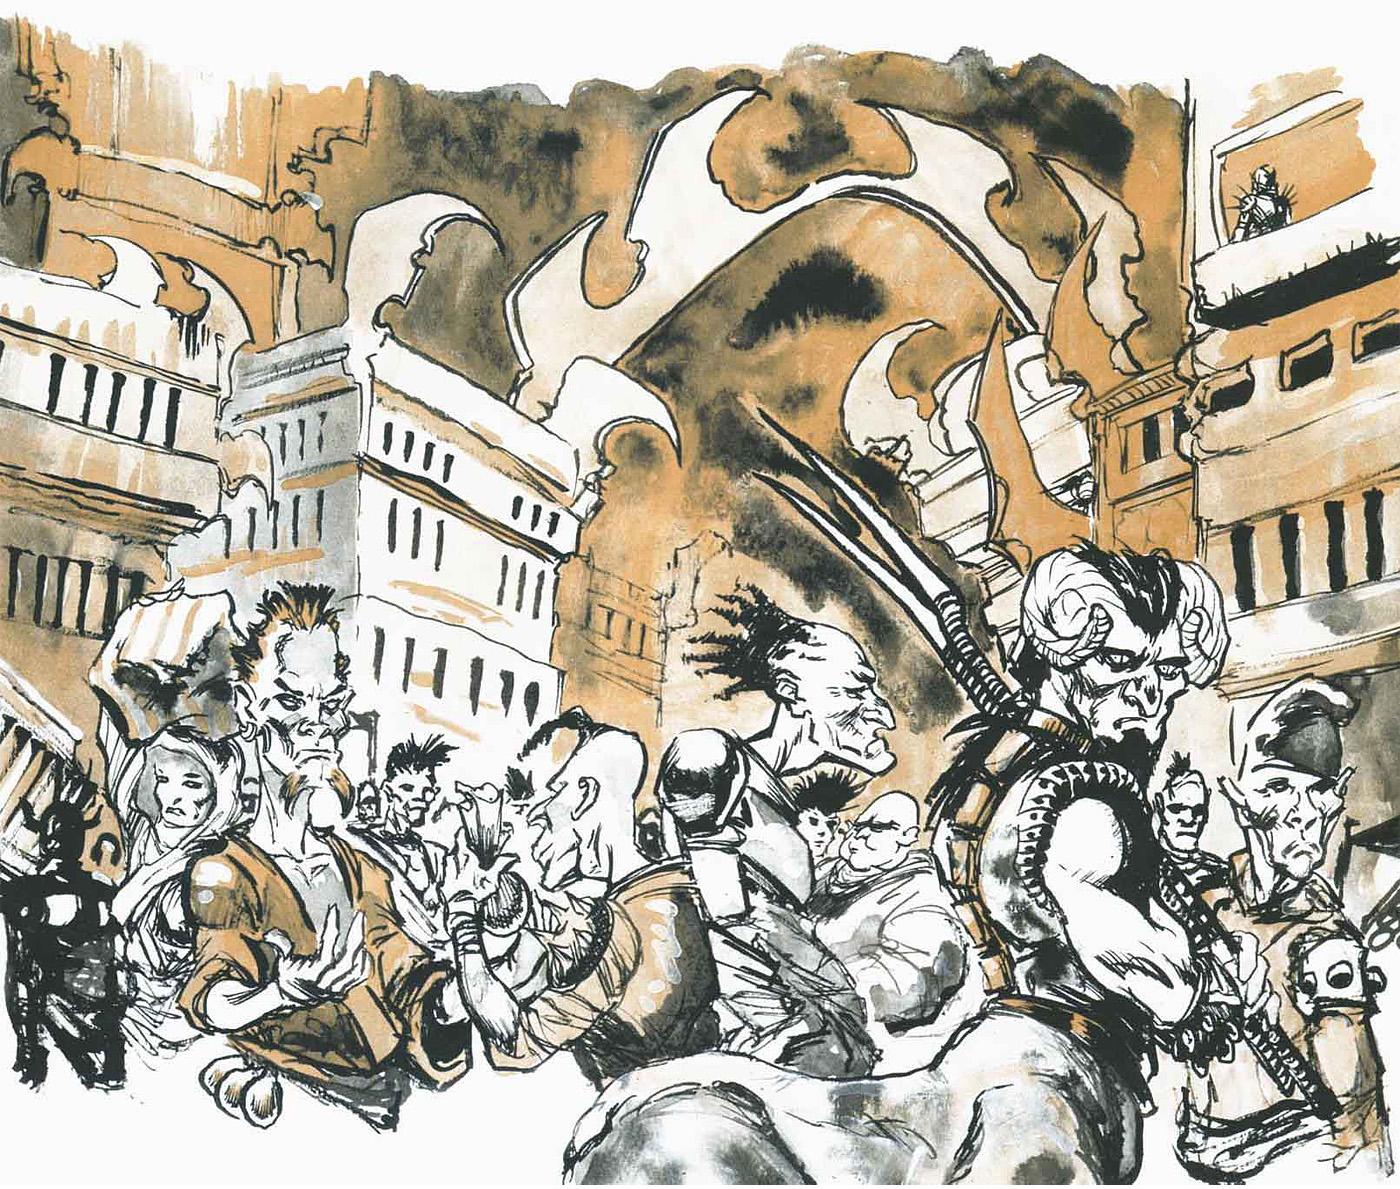 bariaur sigil Bariaur nella Gabbia - by Hannibal King & Adam Rex TSR - Faction War (1998-10) © Wizards of the Coast & Hasbro